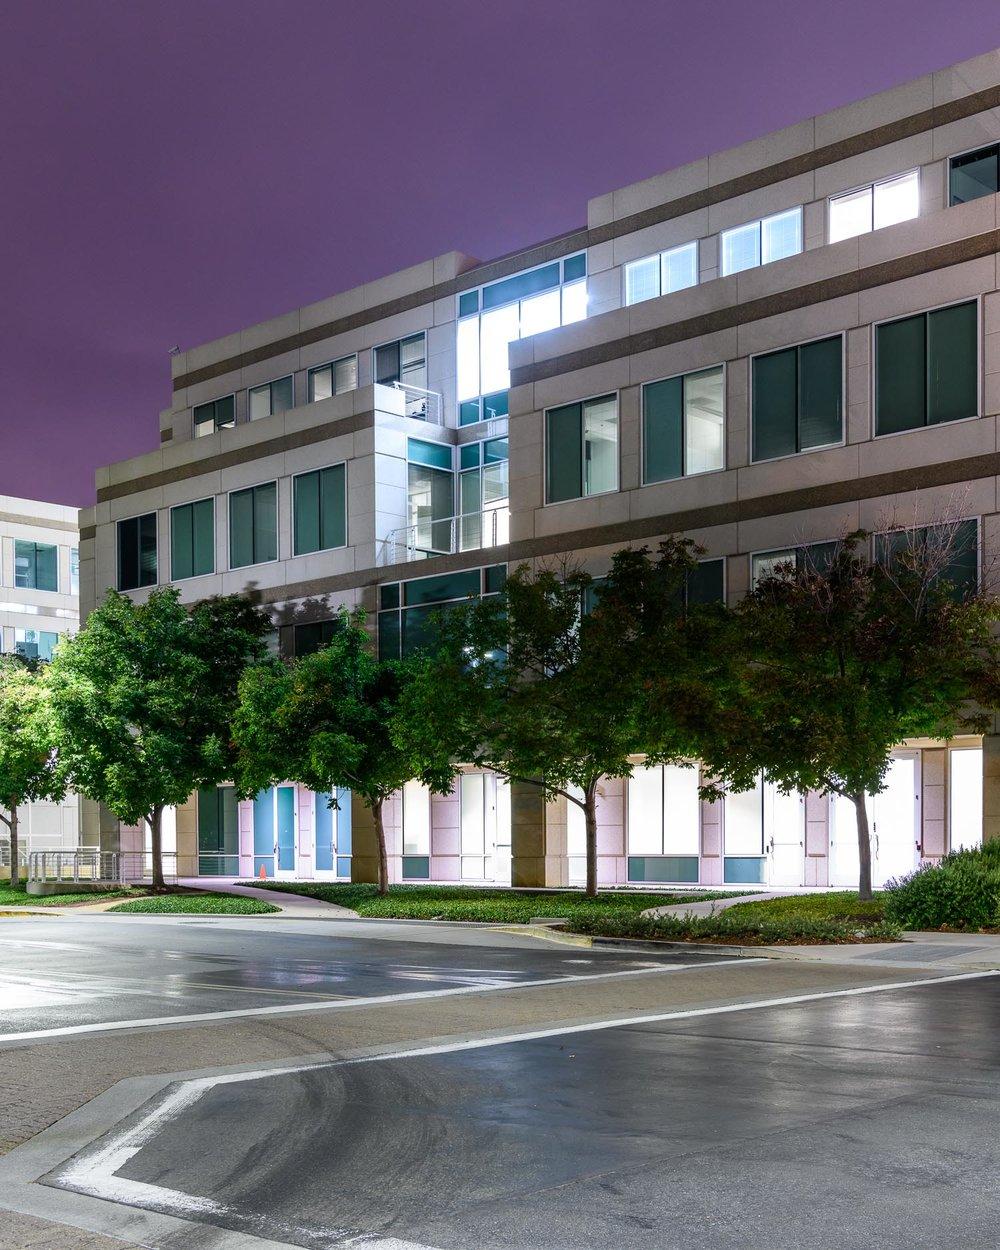 Old Apple headquarters, Cupertino